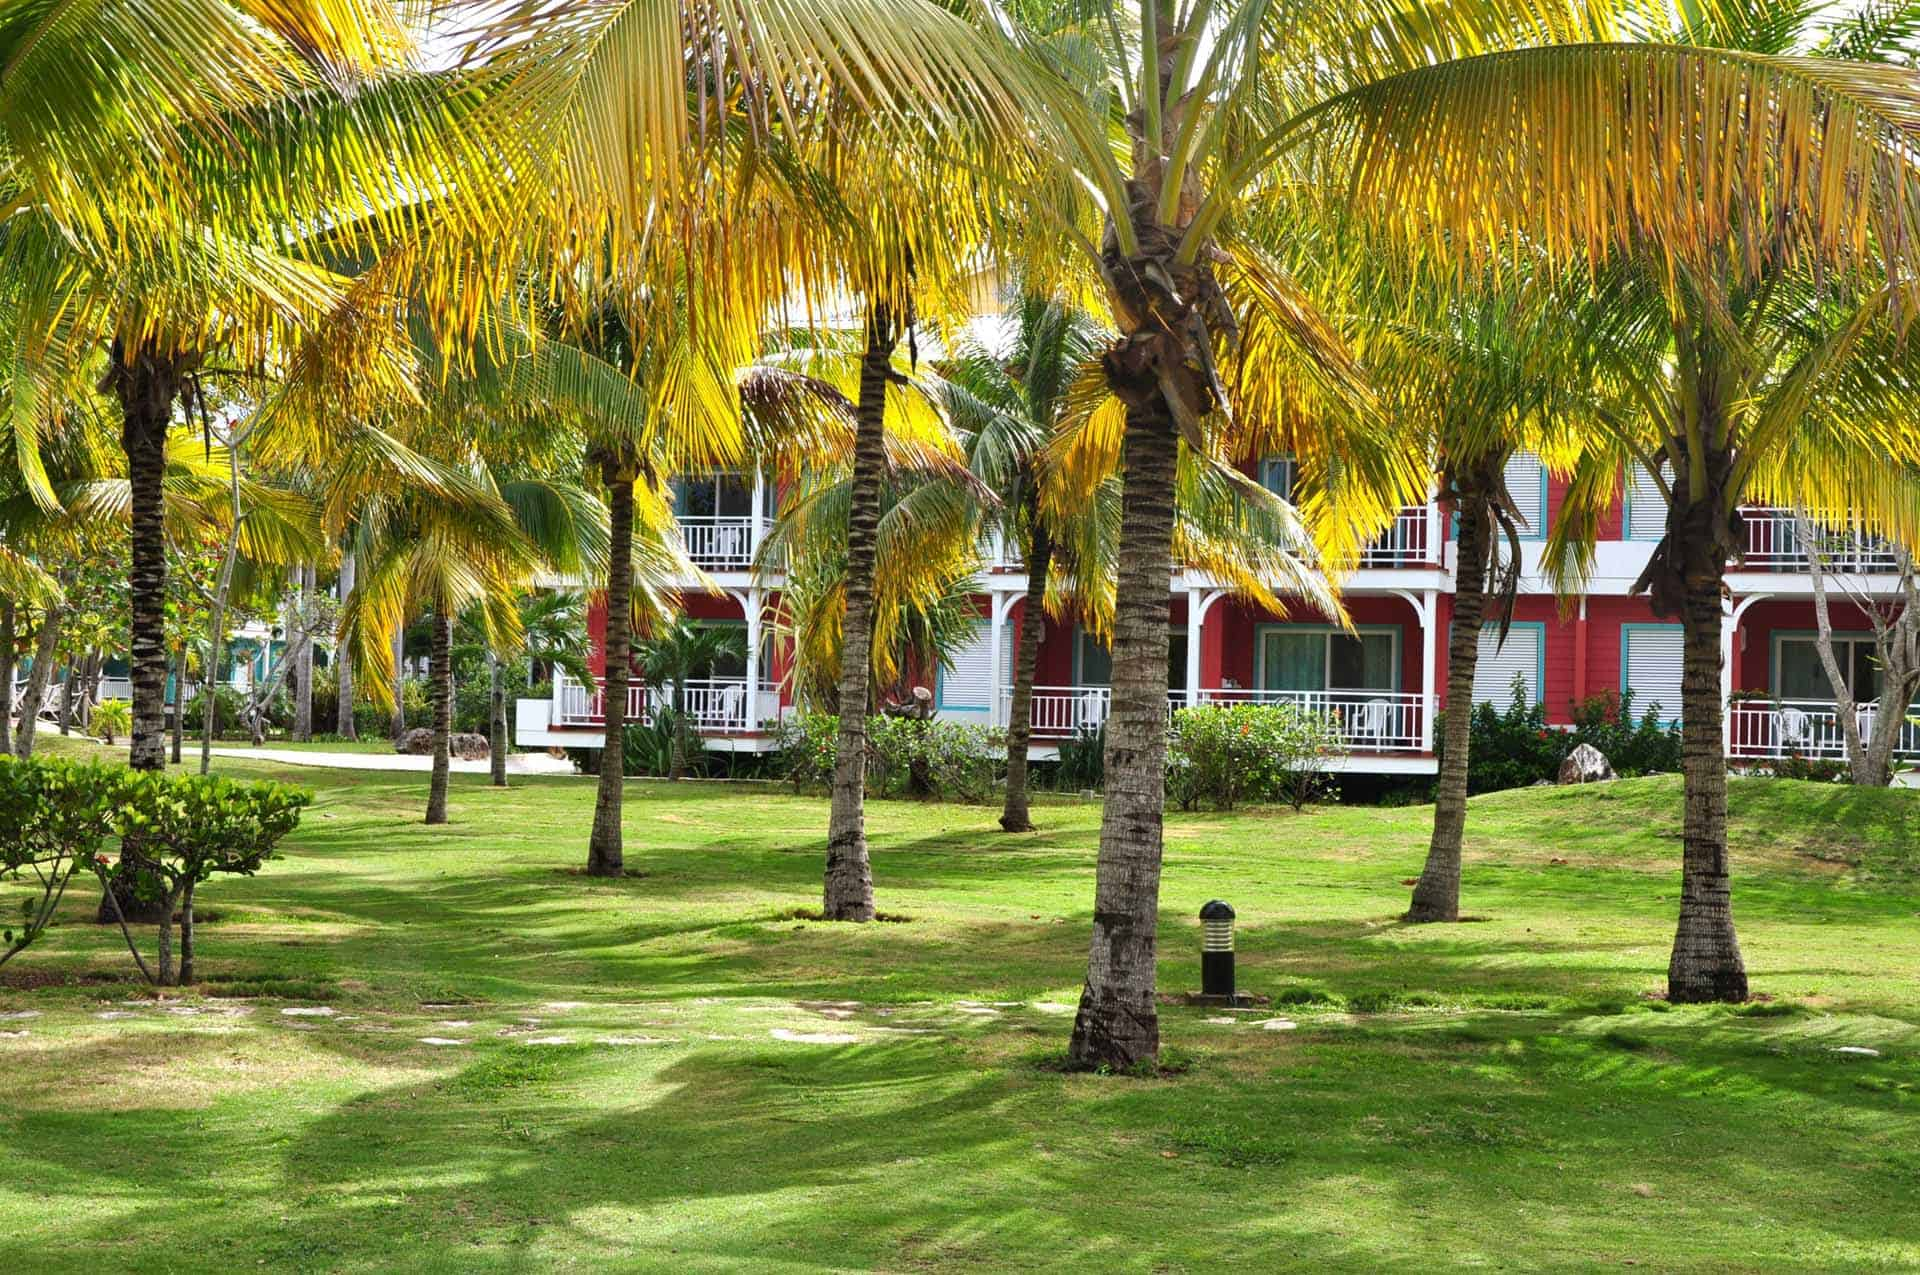 H2417 Hotel Hicacos Varadero 07 cuba autrement